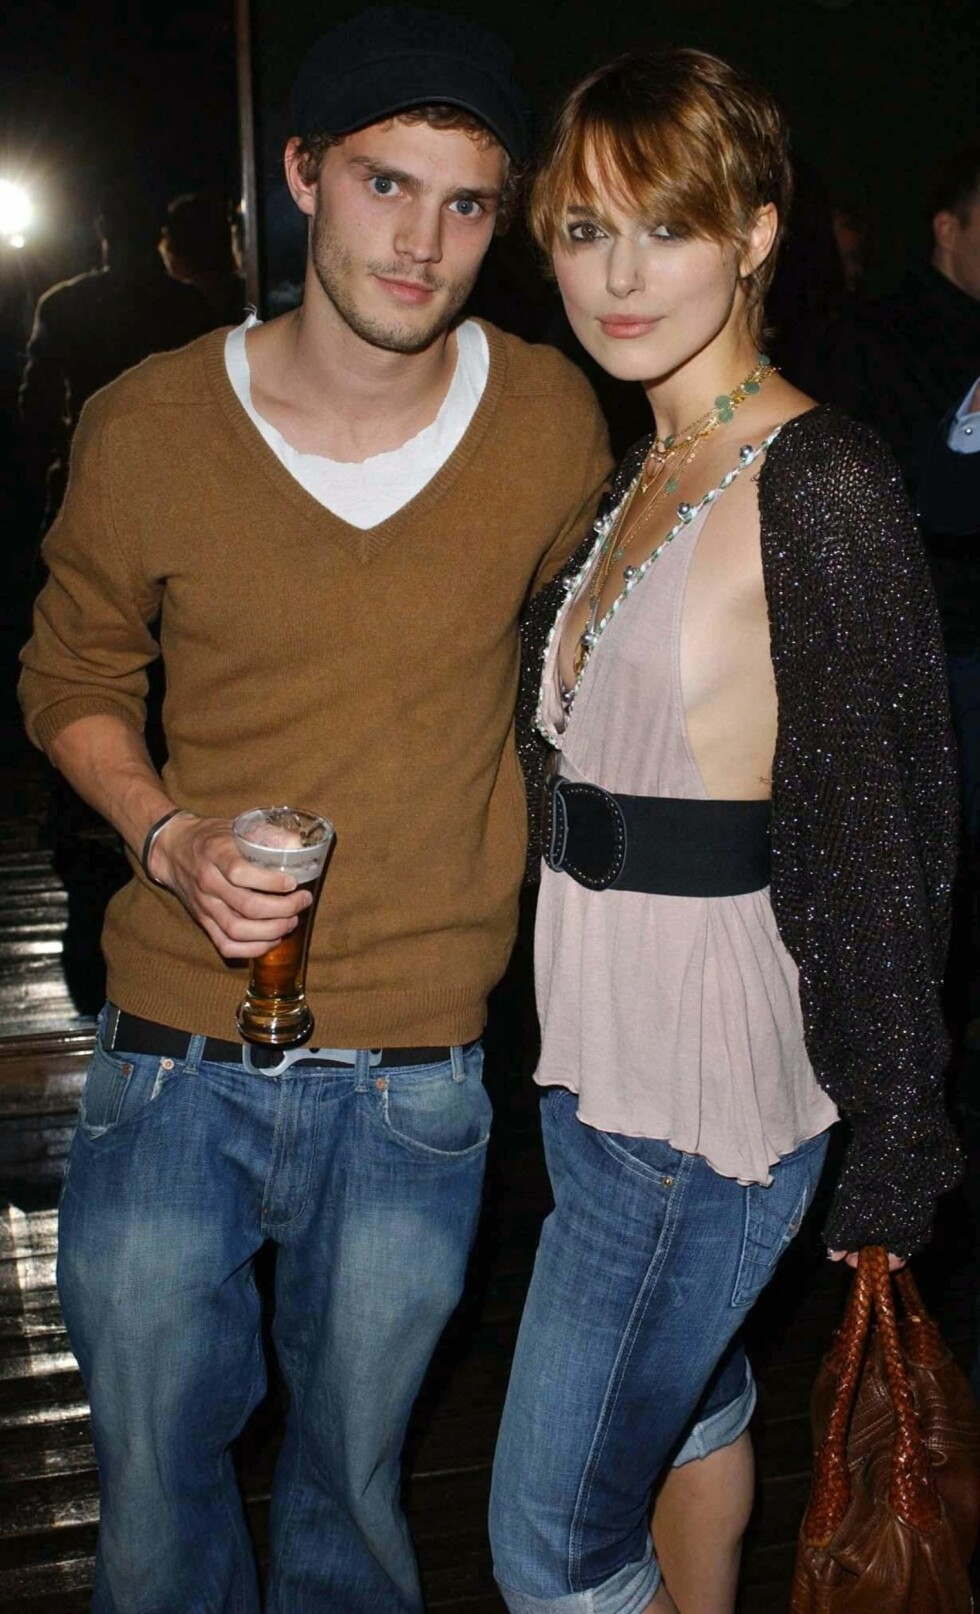 UKJENT KJÆRESTE: Da Keira Knightley datet Jamie Dornan var han kun kjent som Calvin Klein-modell. Nå har han rollen i Fifty Shades of Grey. Foto: Pa Photos